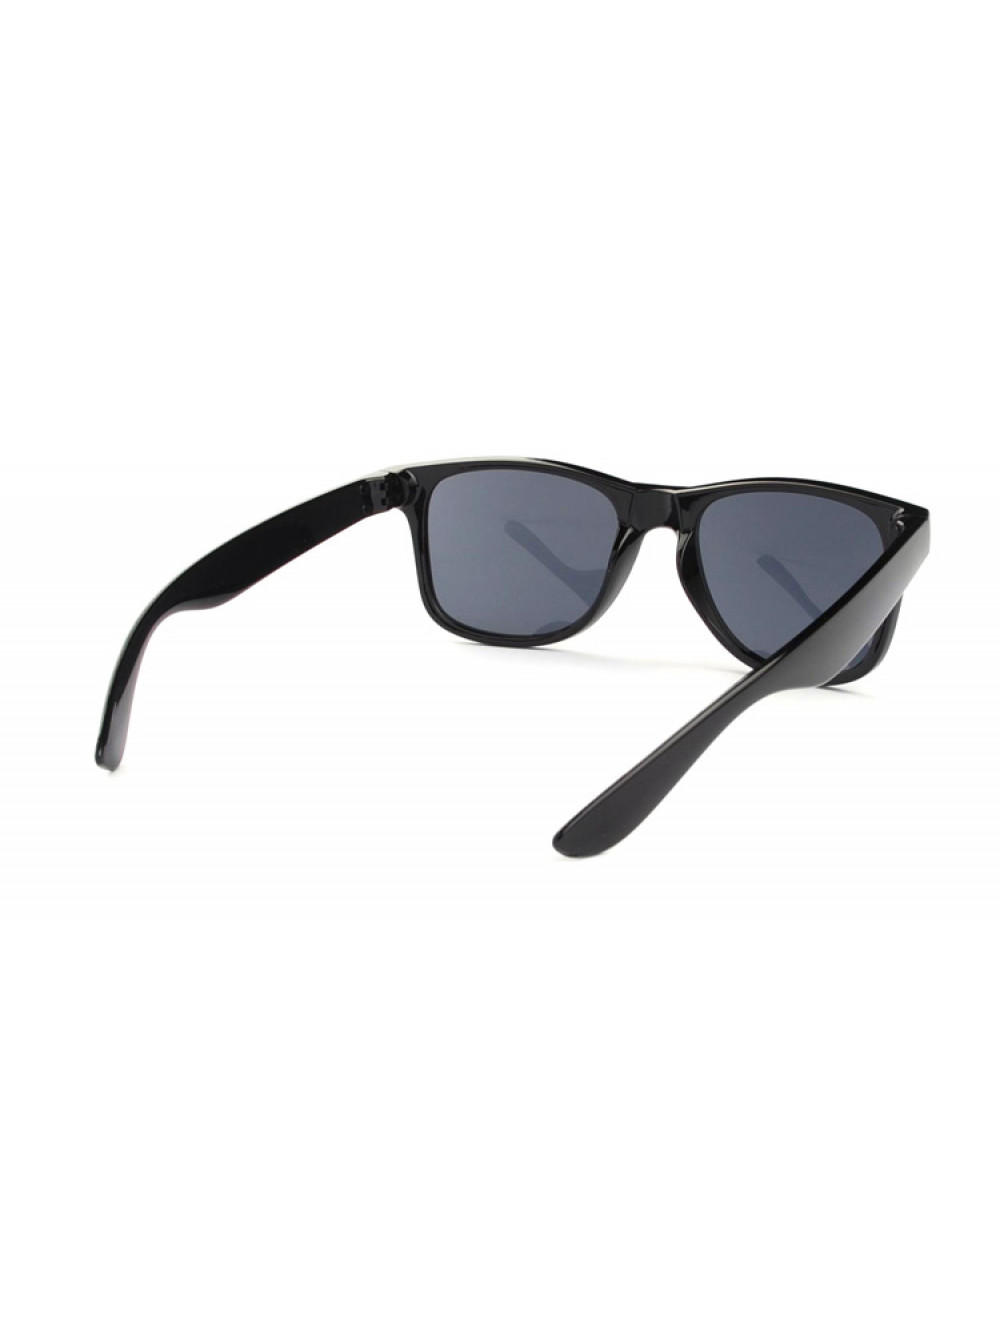 64c0ae264 Slnečné okuliare Wayfarer Classic Black